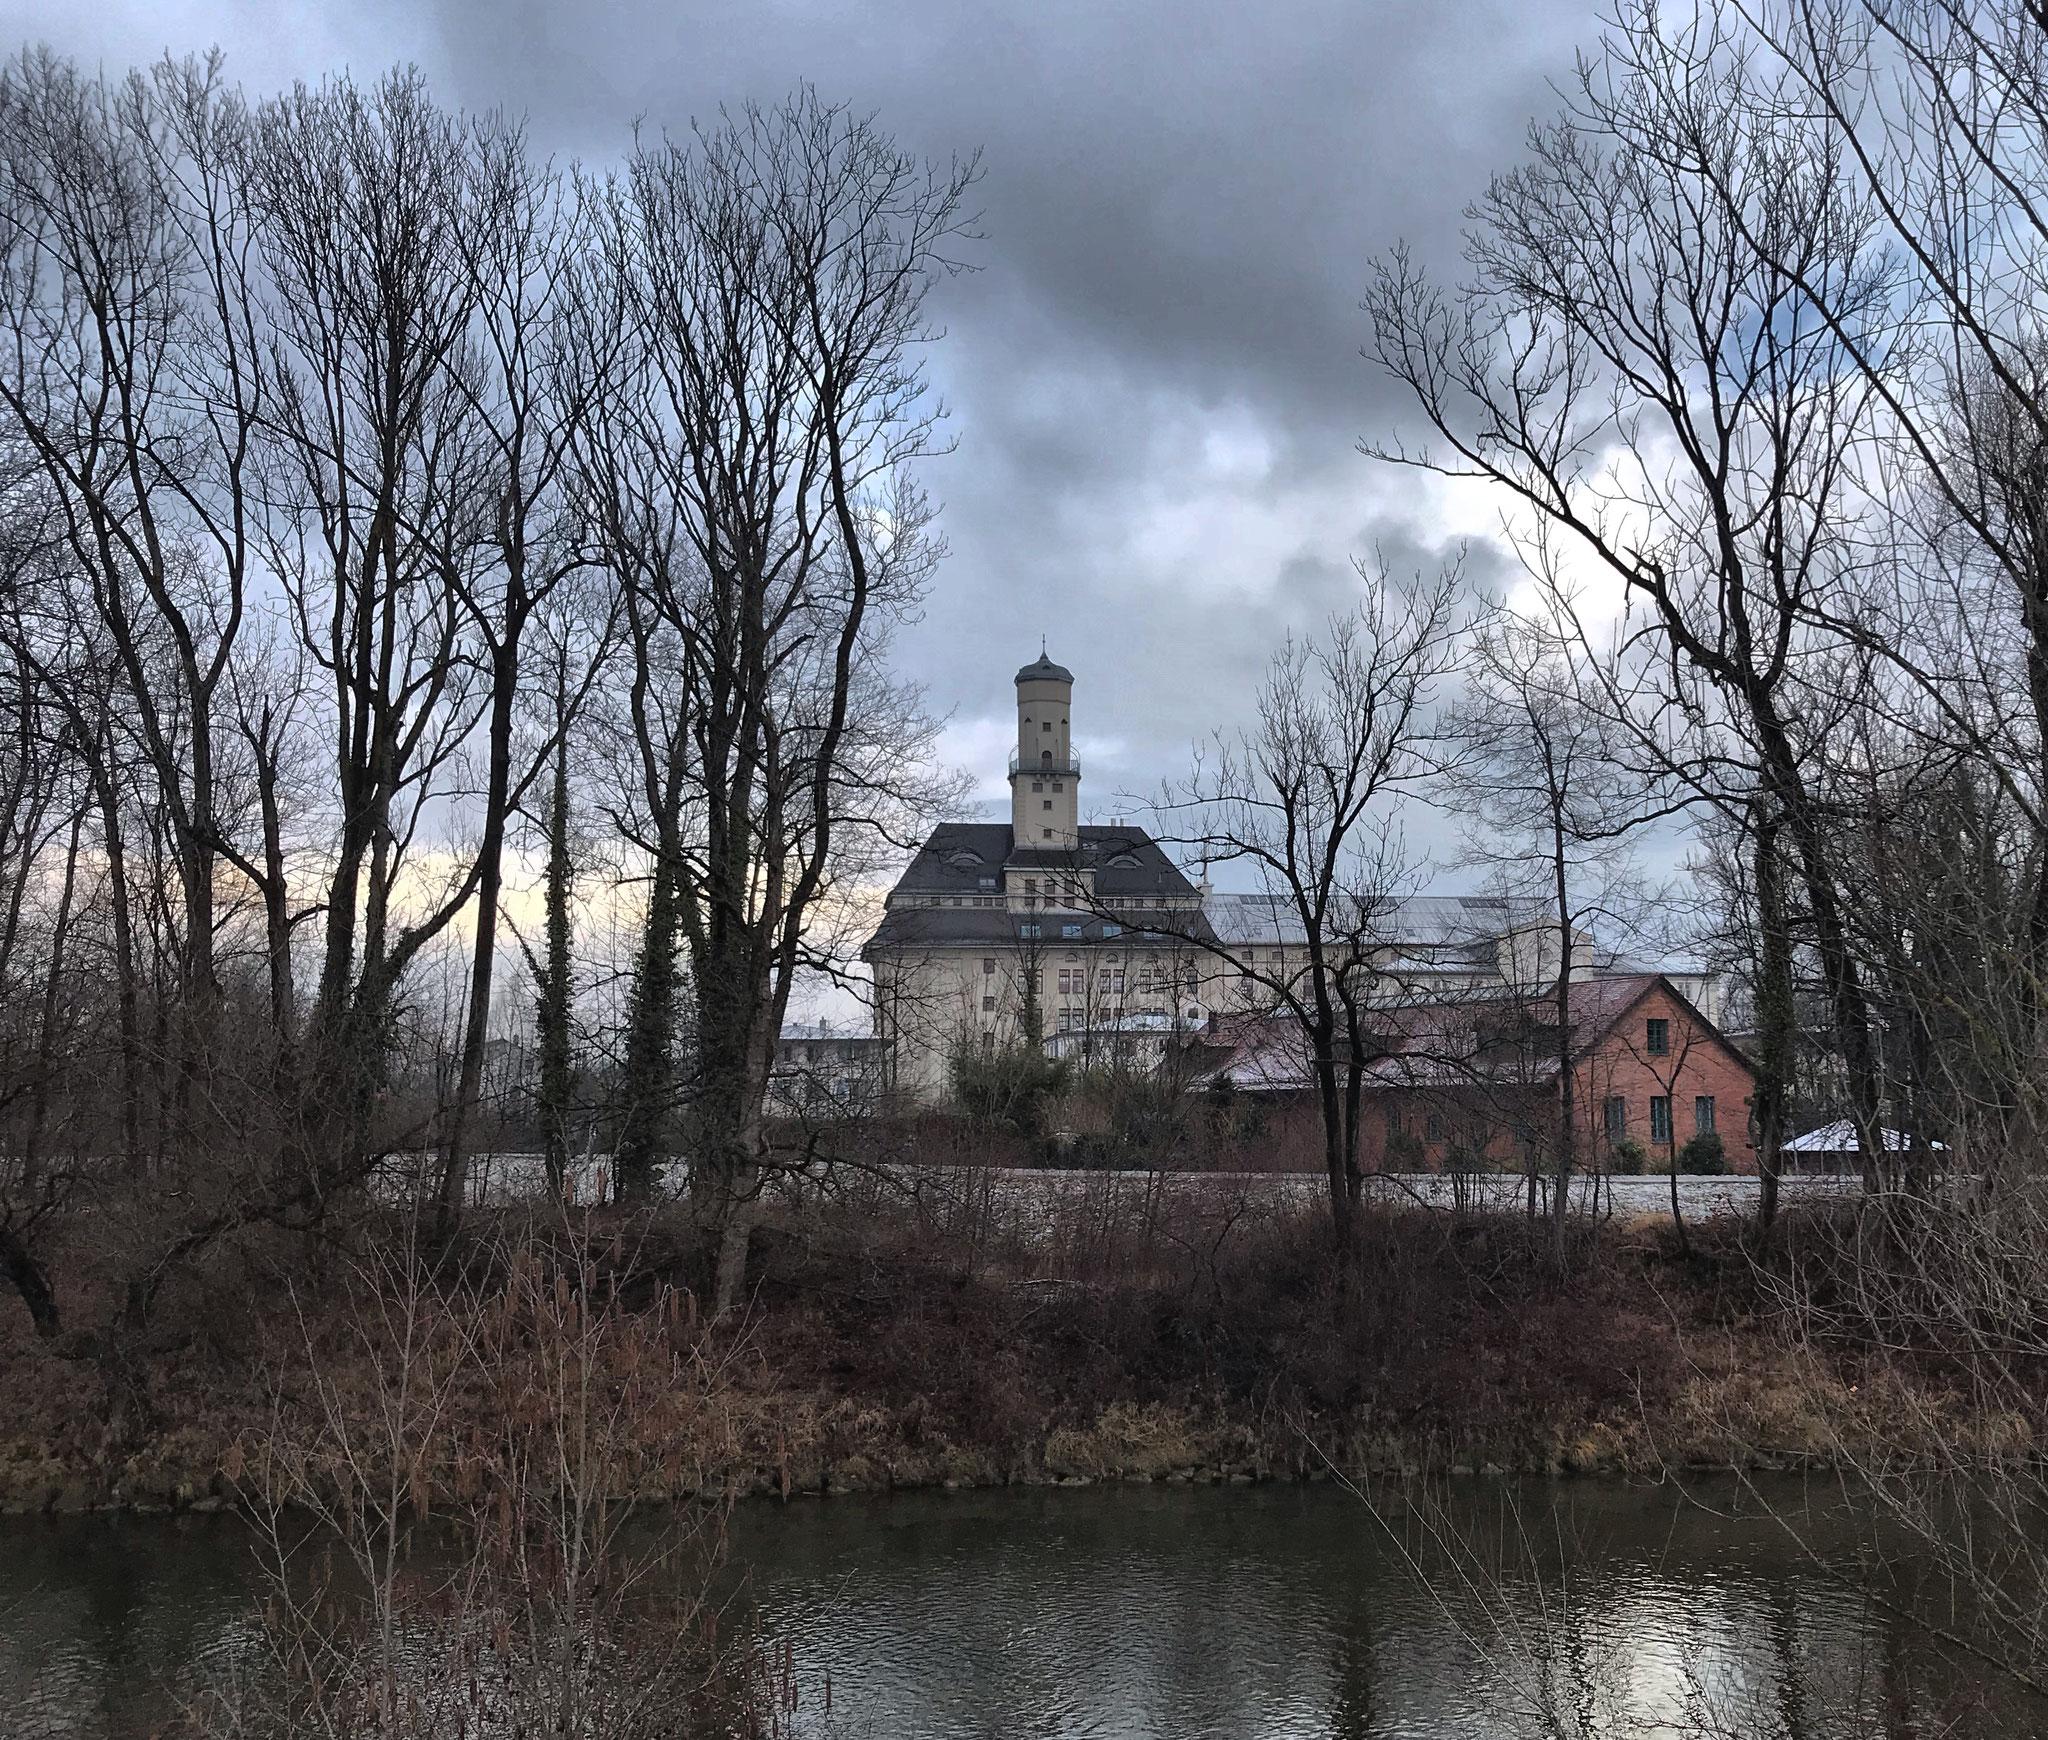 Etappe W01: Rosenheim - Westerndorf